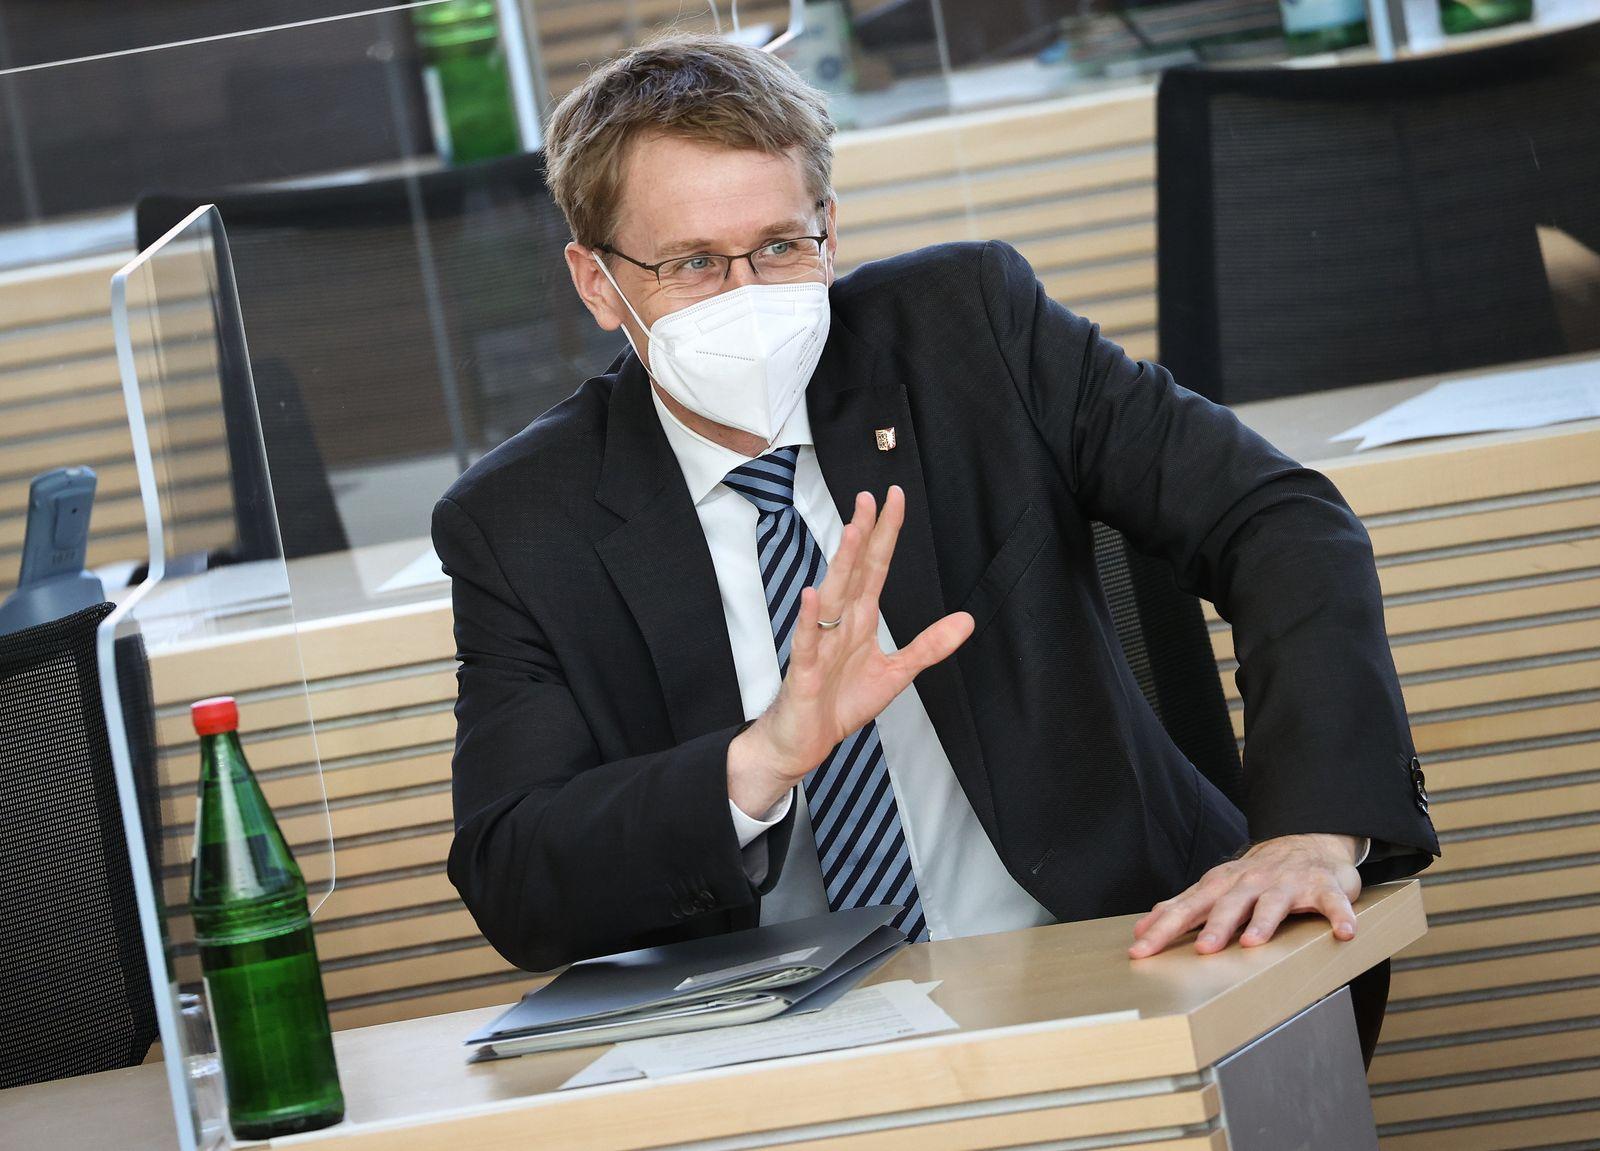 Sondersitzung des Landtags Kiel